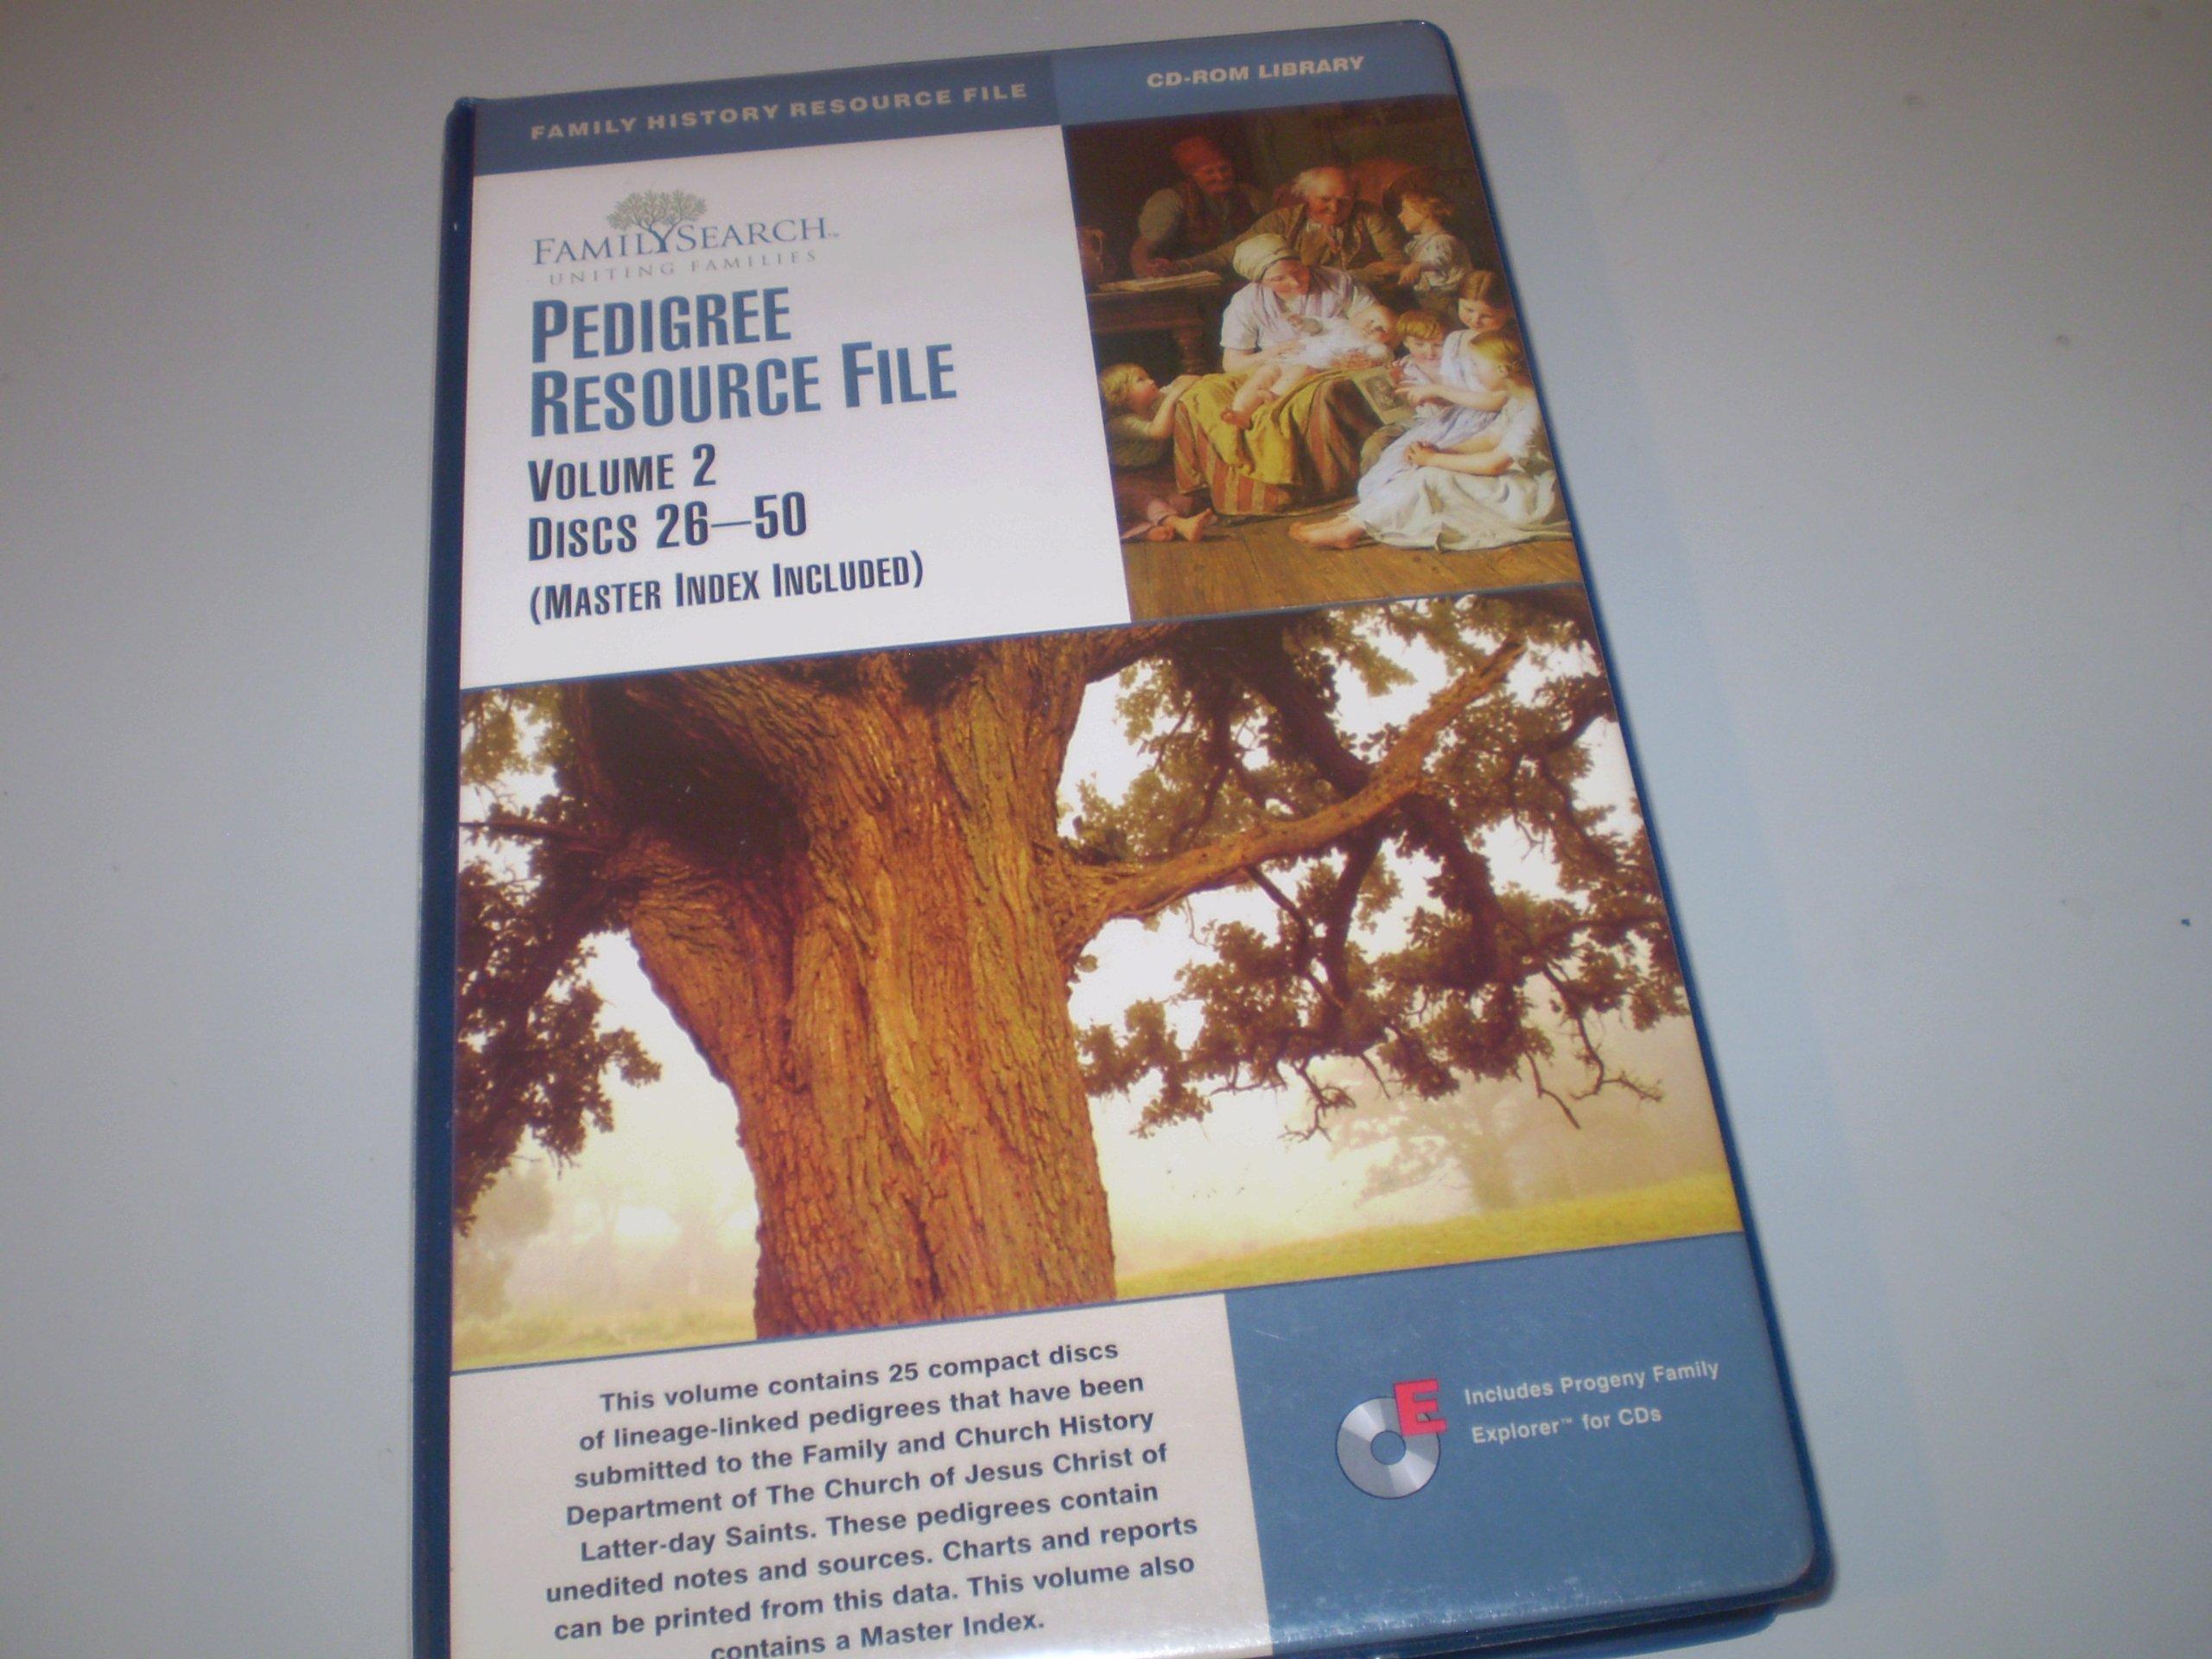 Read Online Pedigree Resource File ((Master Index Included), Volume 2 / Discs 26-50) pdf